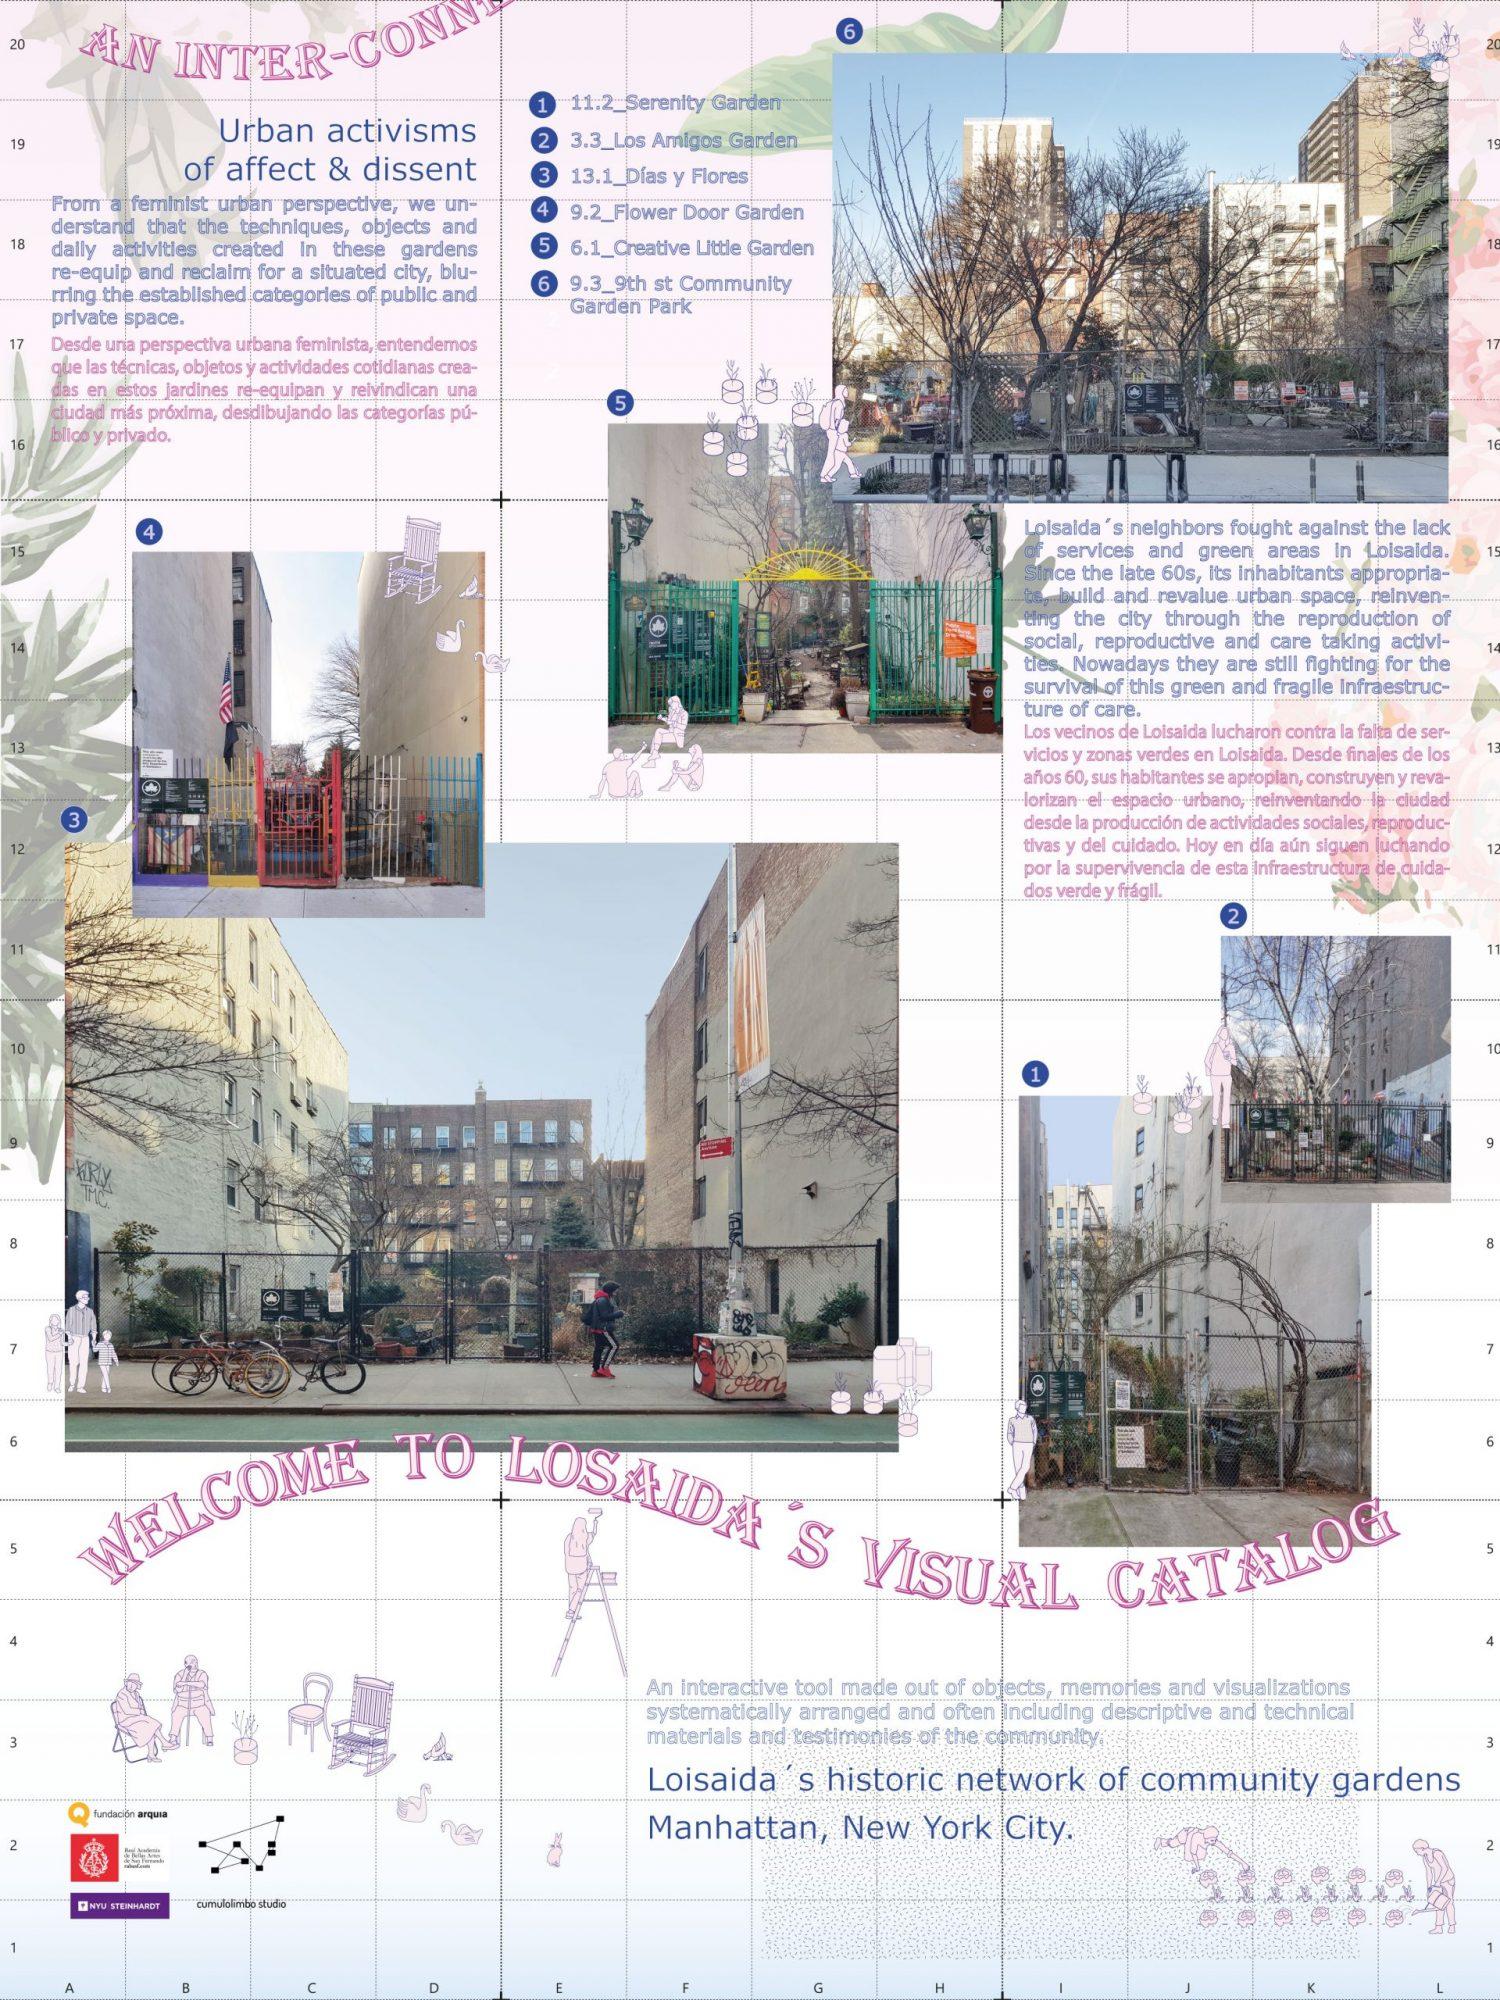 loi_jardines-loisaida_-cumulolimbo-studio